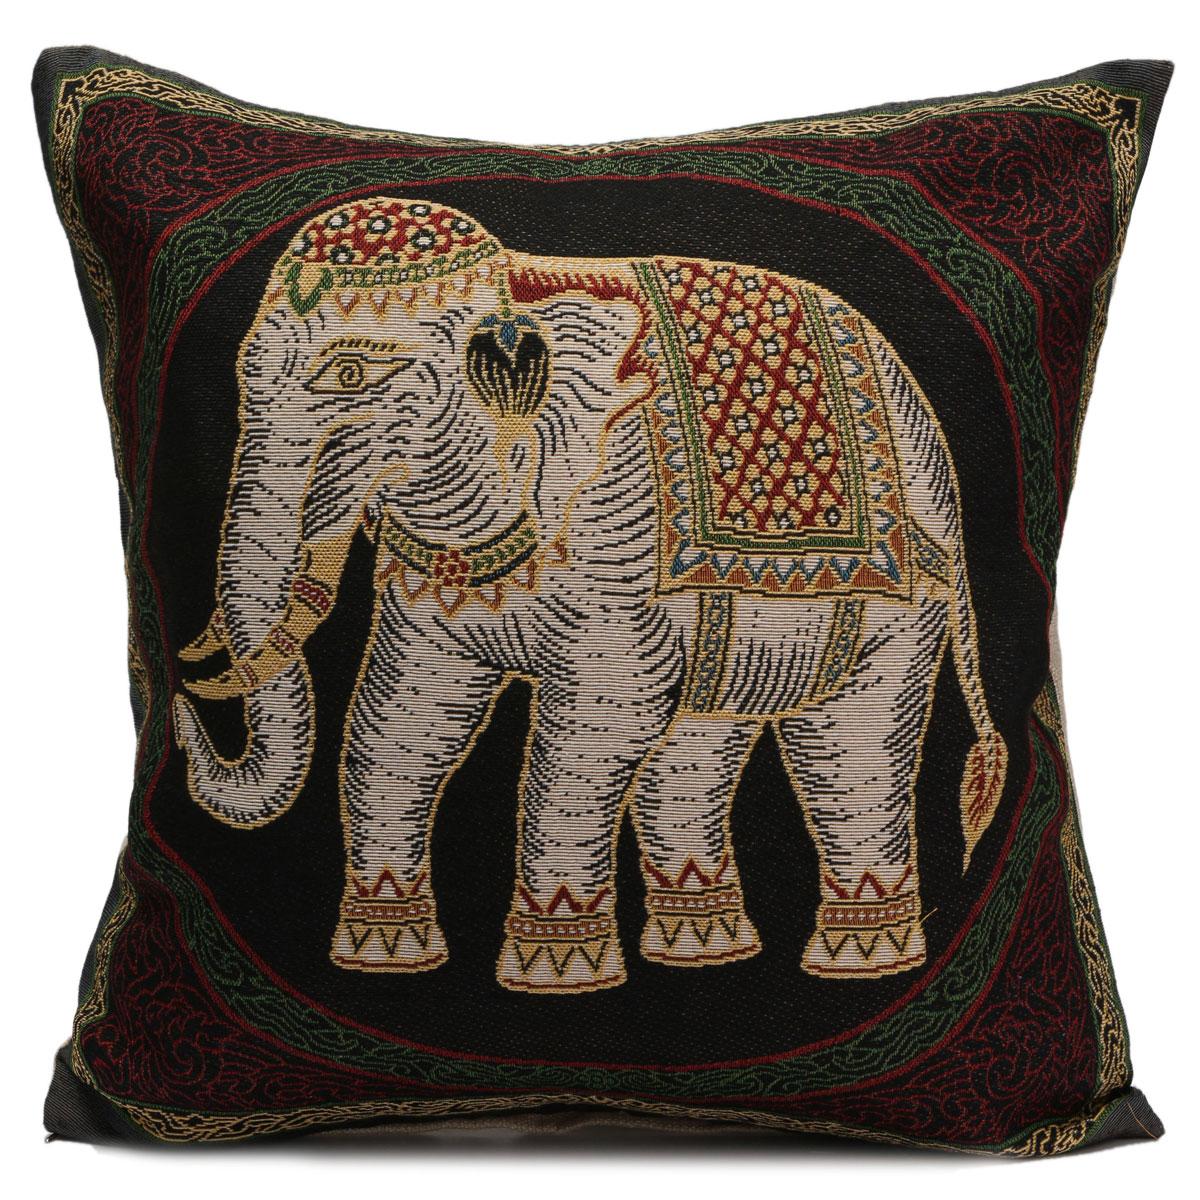 Elephant Throw Pillow Case : 18